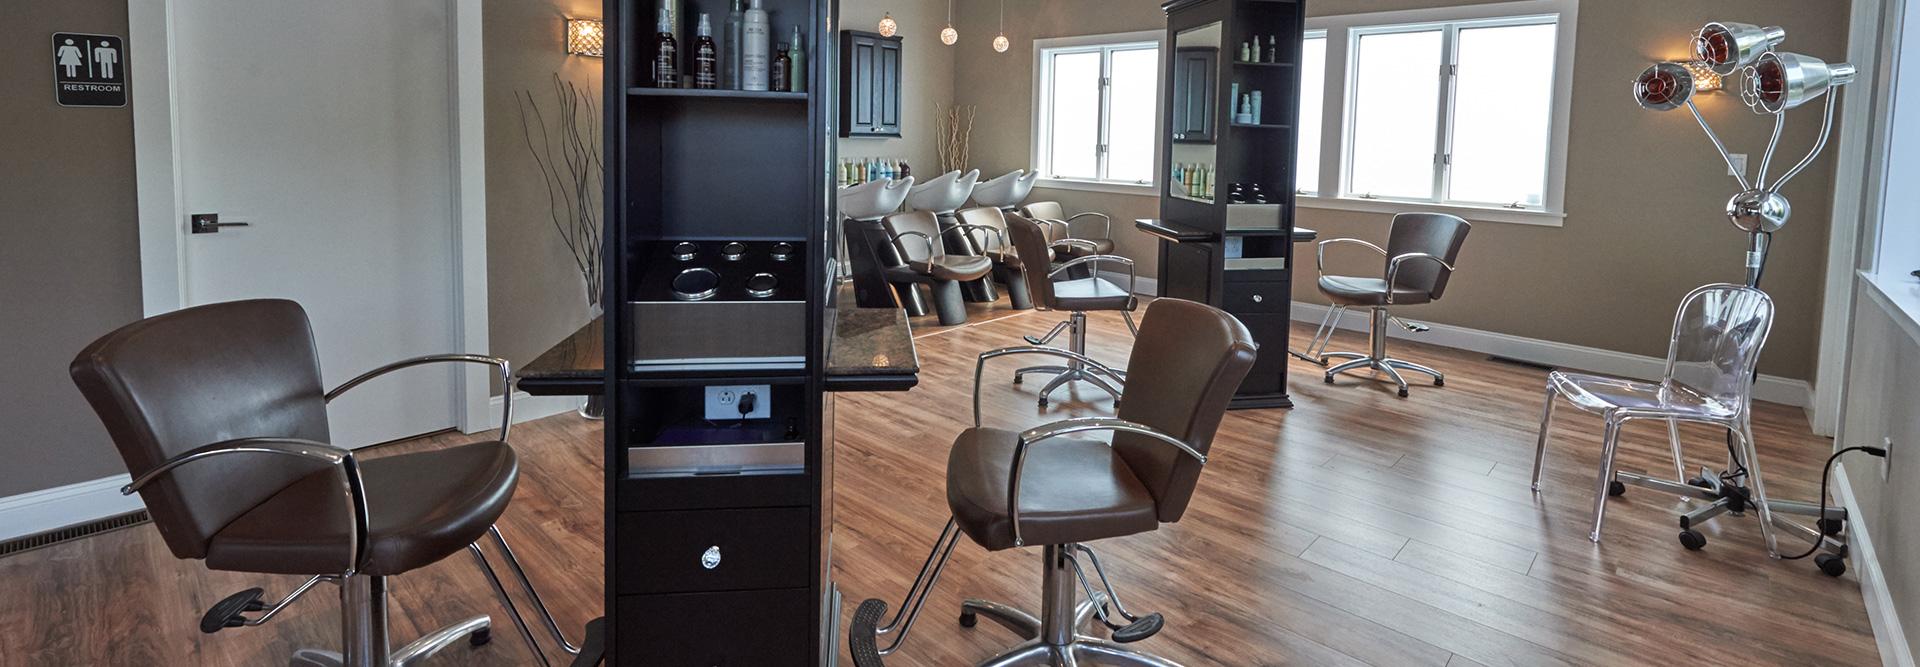 salon22 stylists chairs